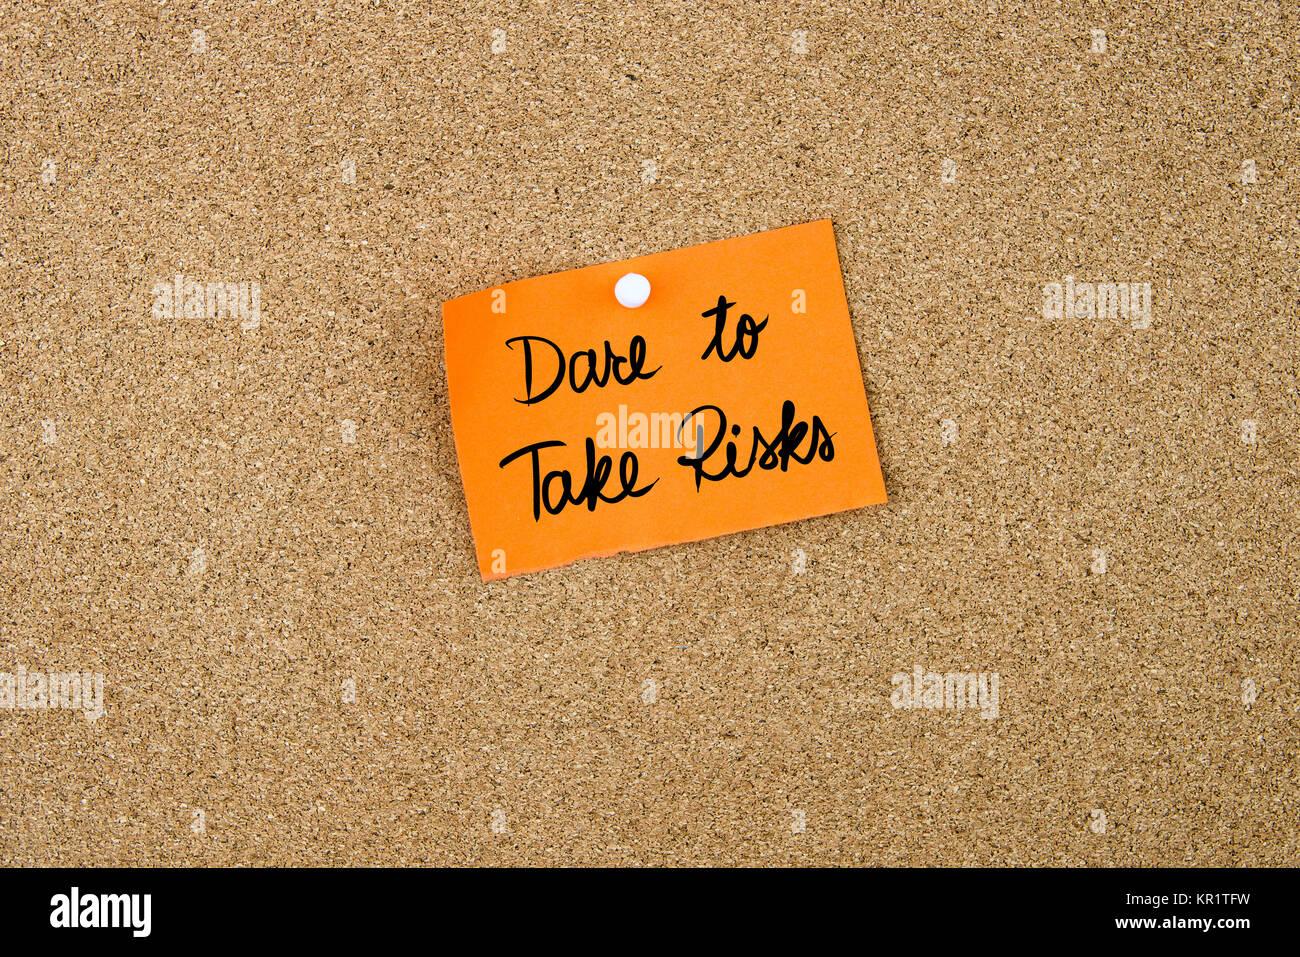 Dare To Take Risks written on orange paper note - Stock Image